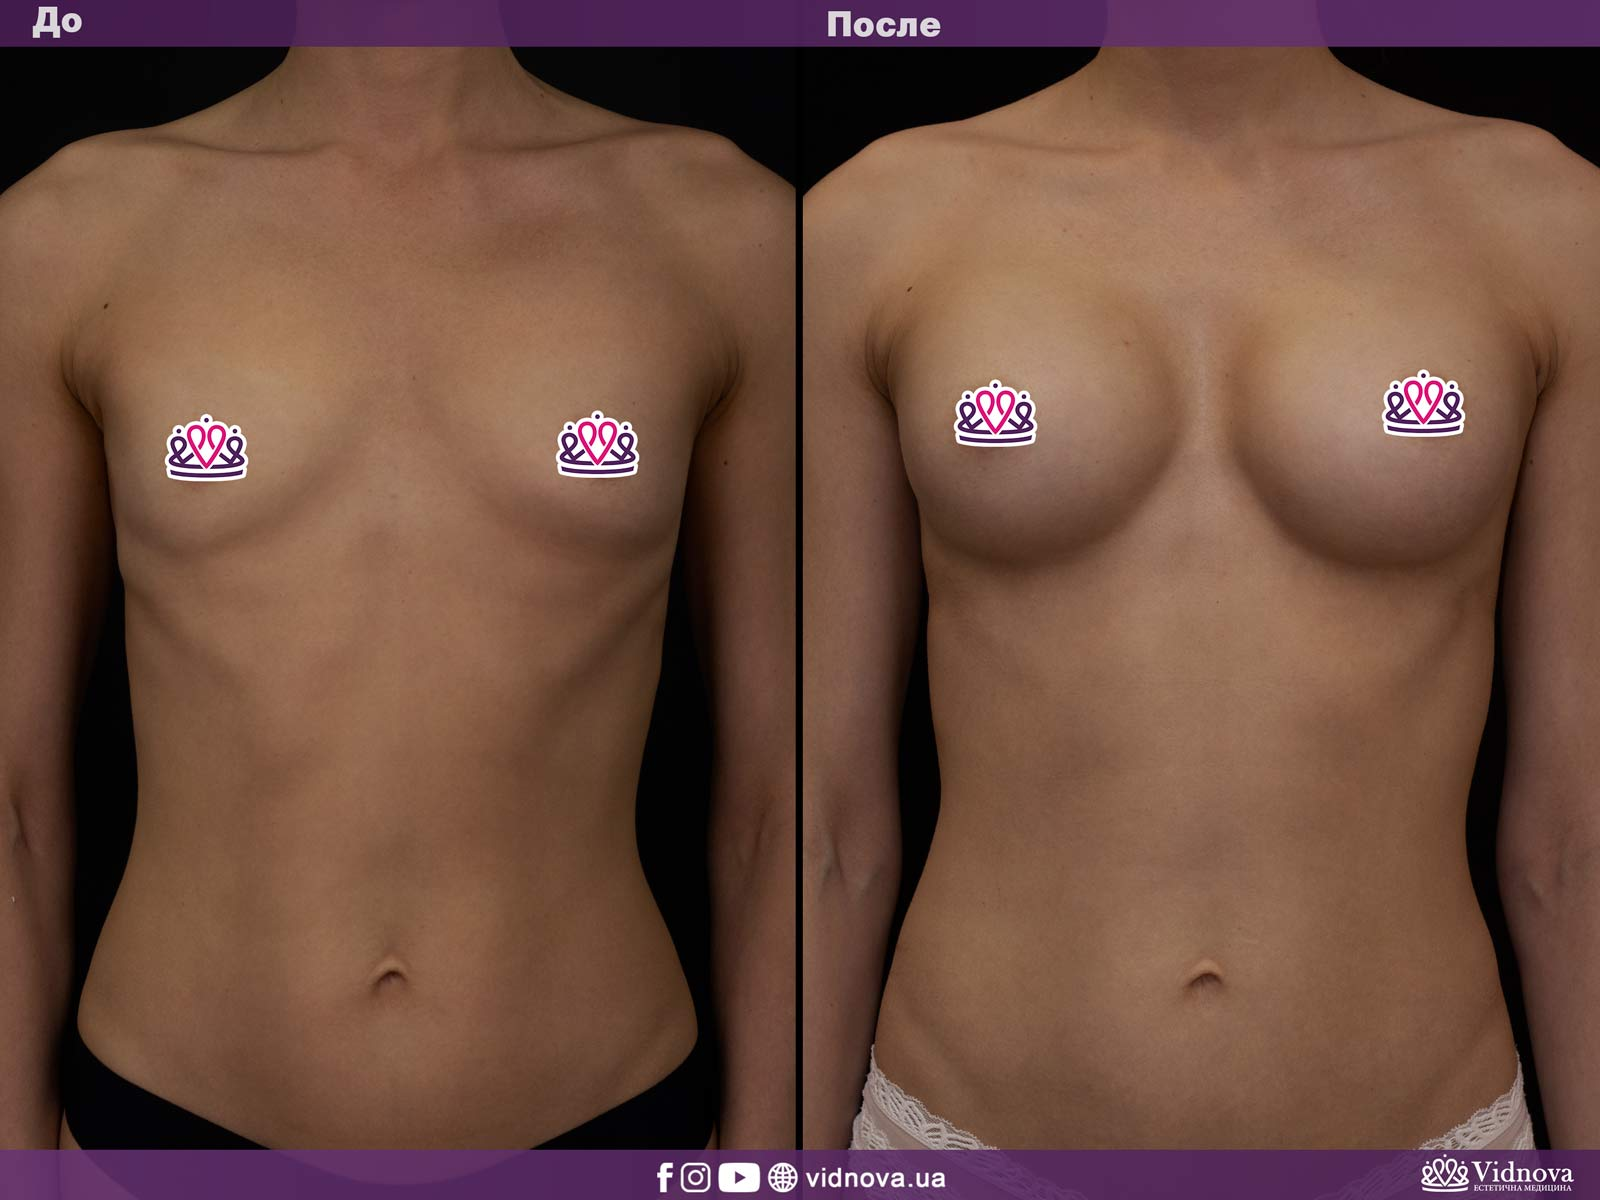 Увеличение груди: Фото ДО и ПОСЛЕ - Пример №21-1 - Клиника Vidnova